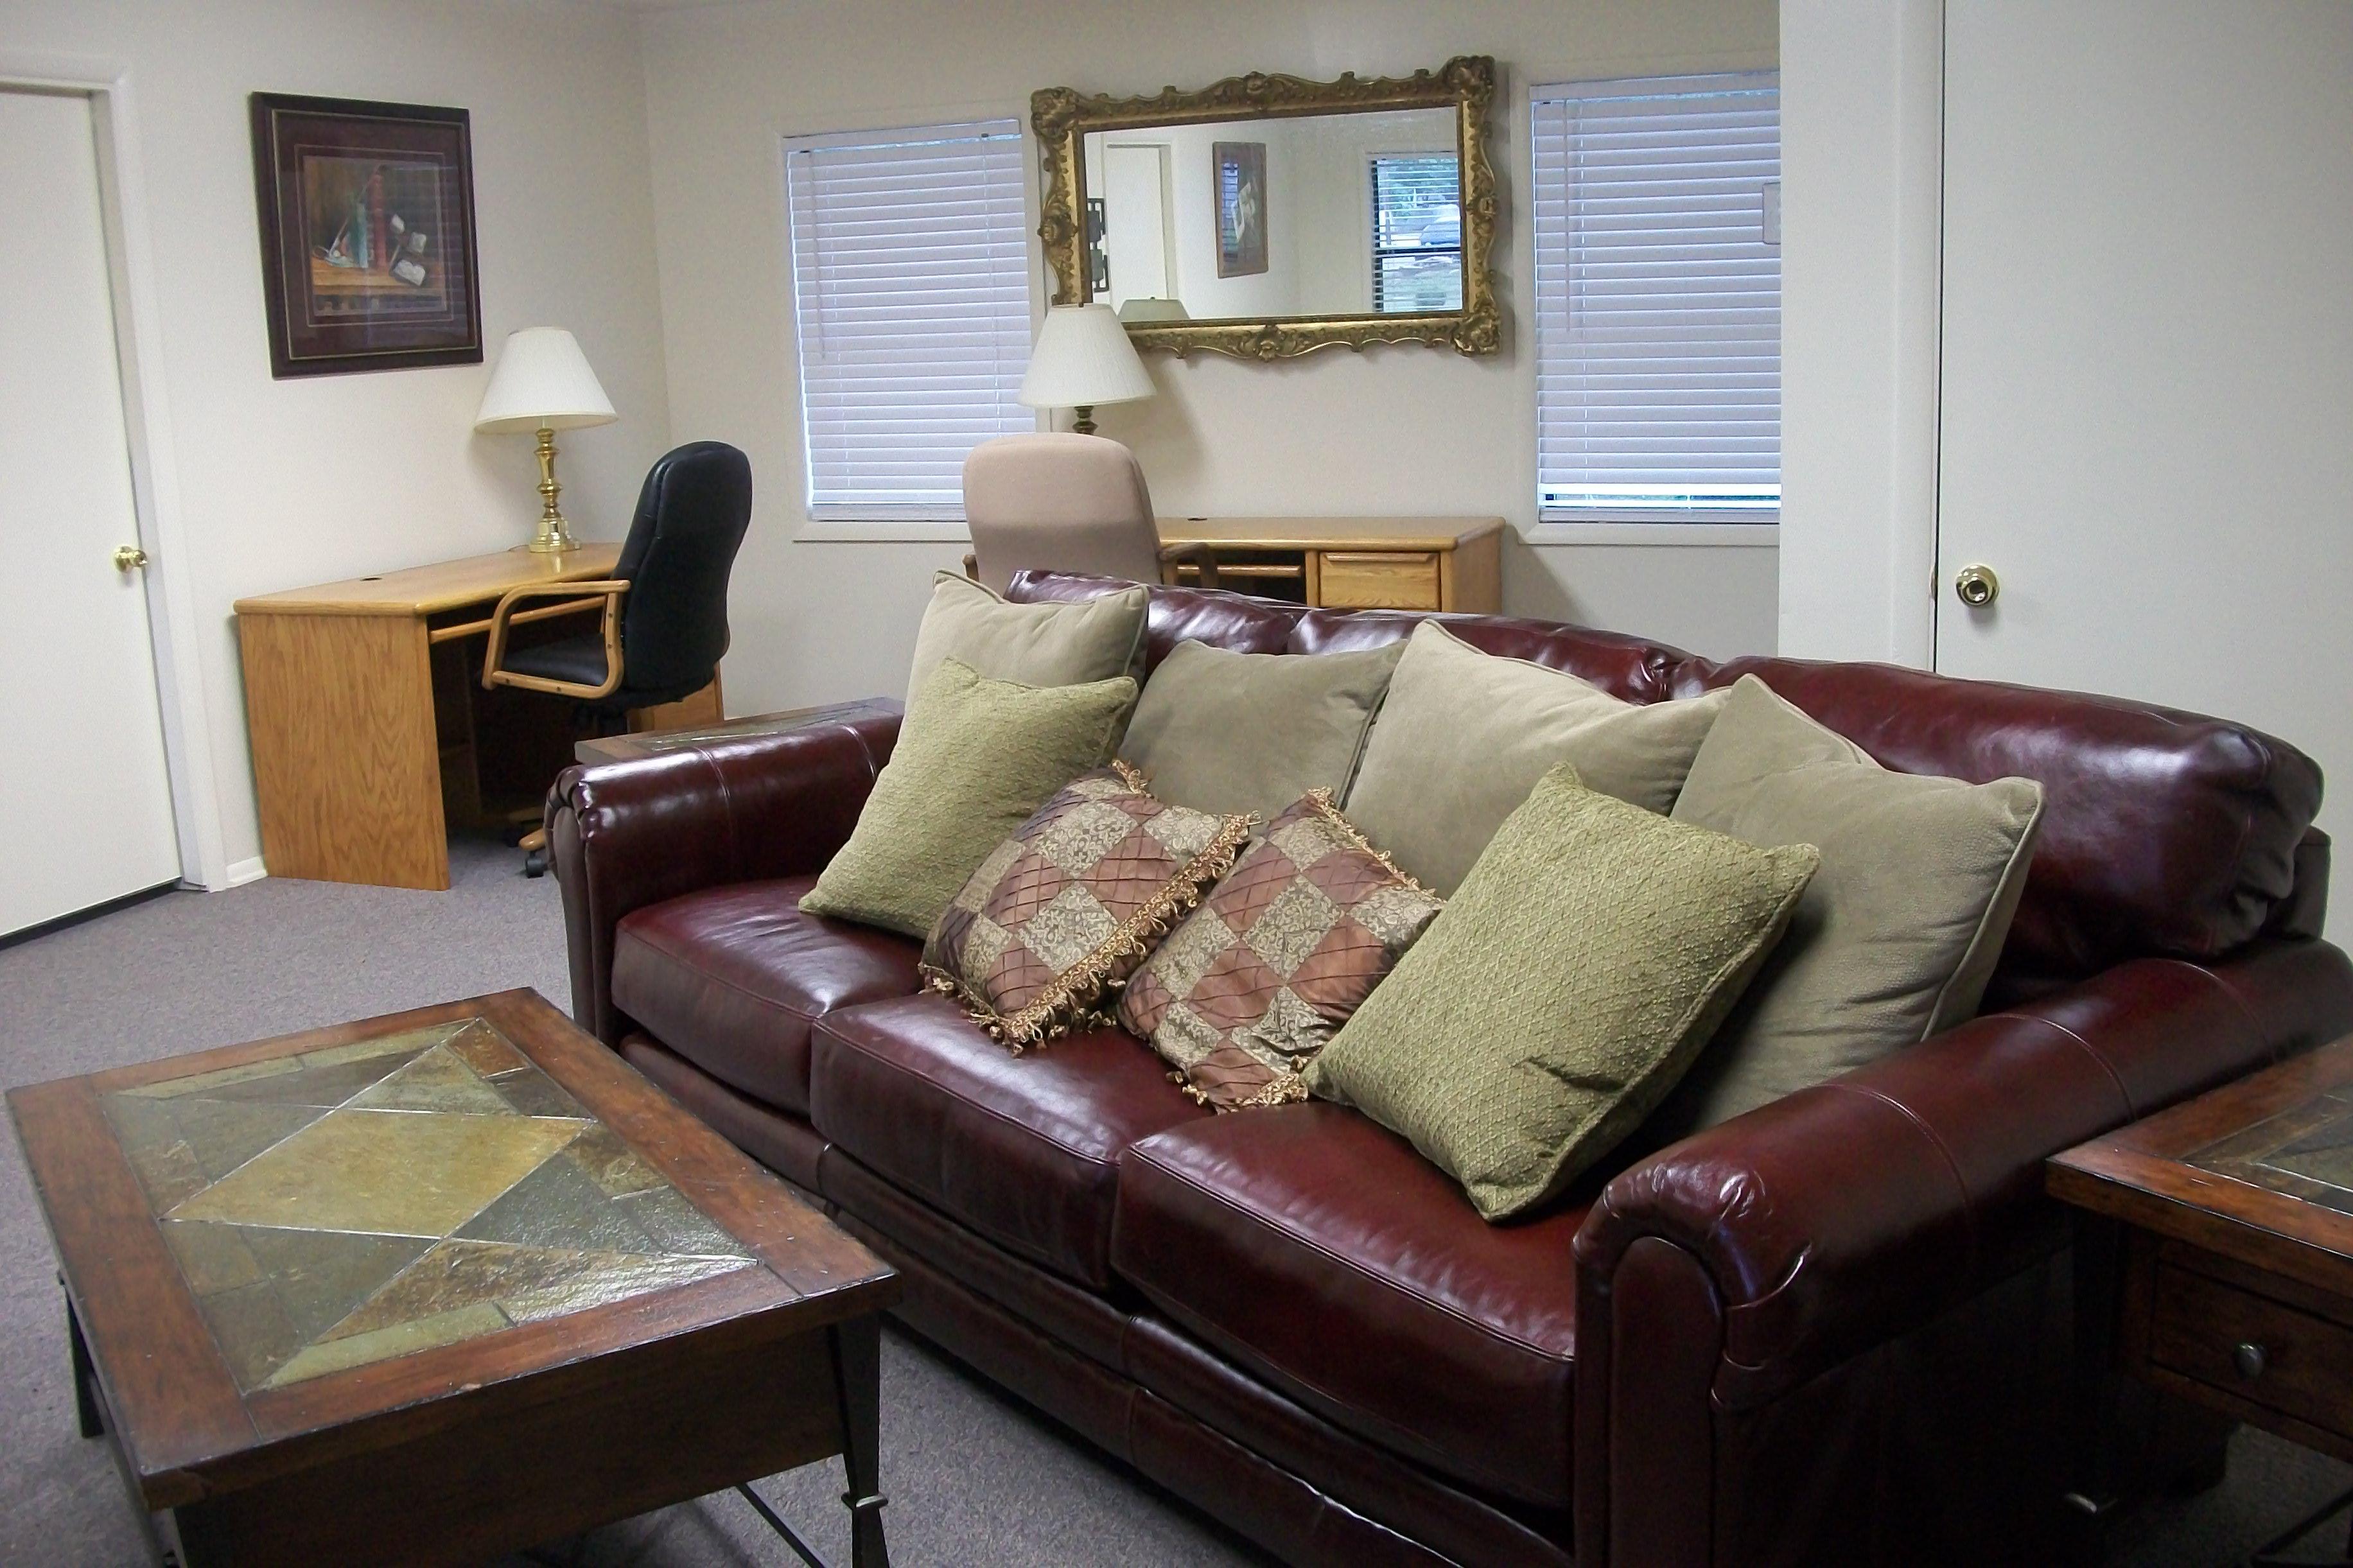 Harbor House - Fort Smith - Treatment Center